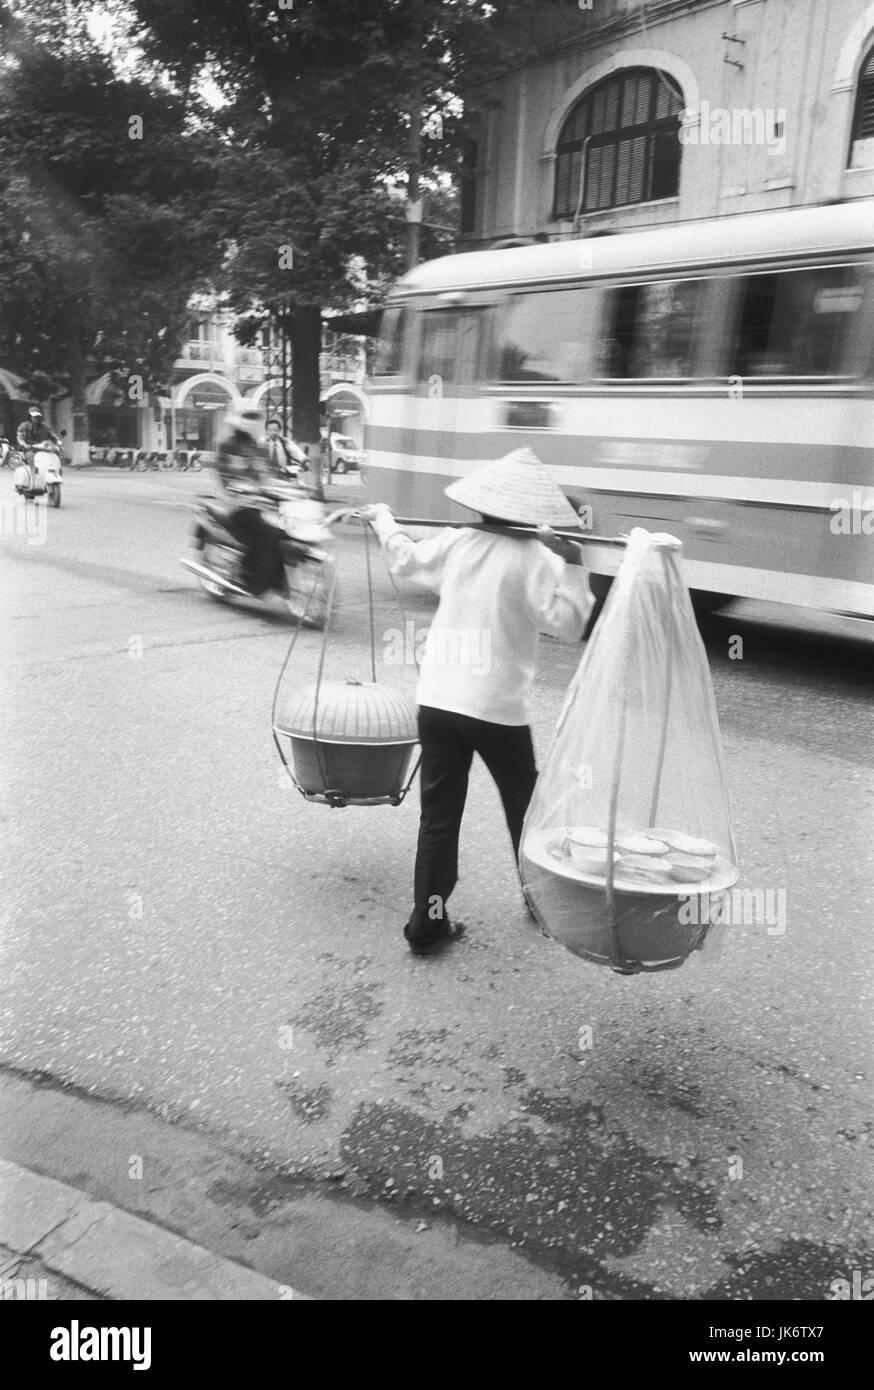 Vietnam, Hanoi, Straße, Frau, Last,  Körbe, Lebensmittel, Rückenansicht,  s/w, no model release außen, - Stock Image